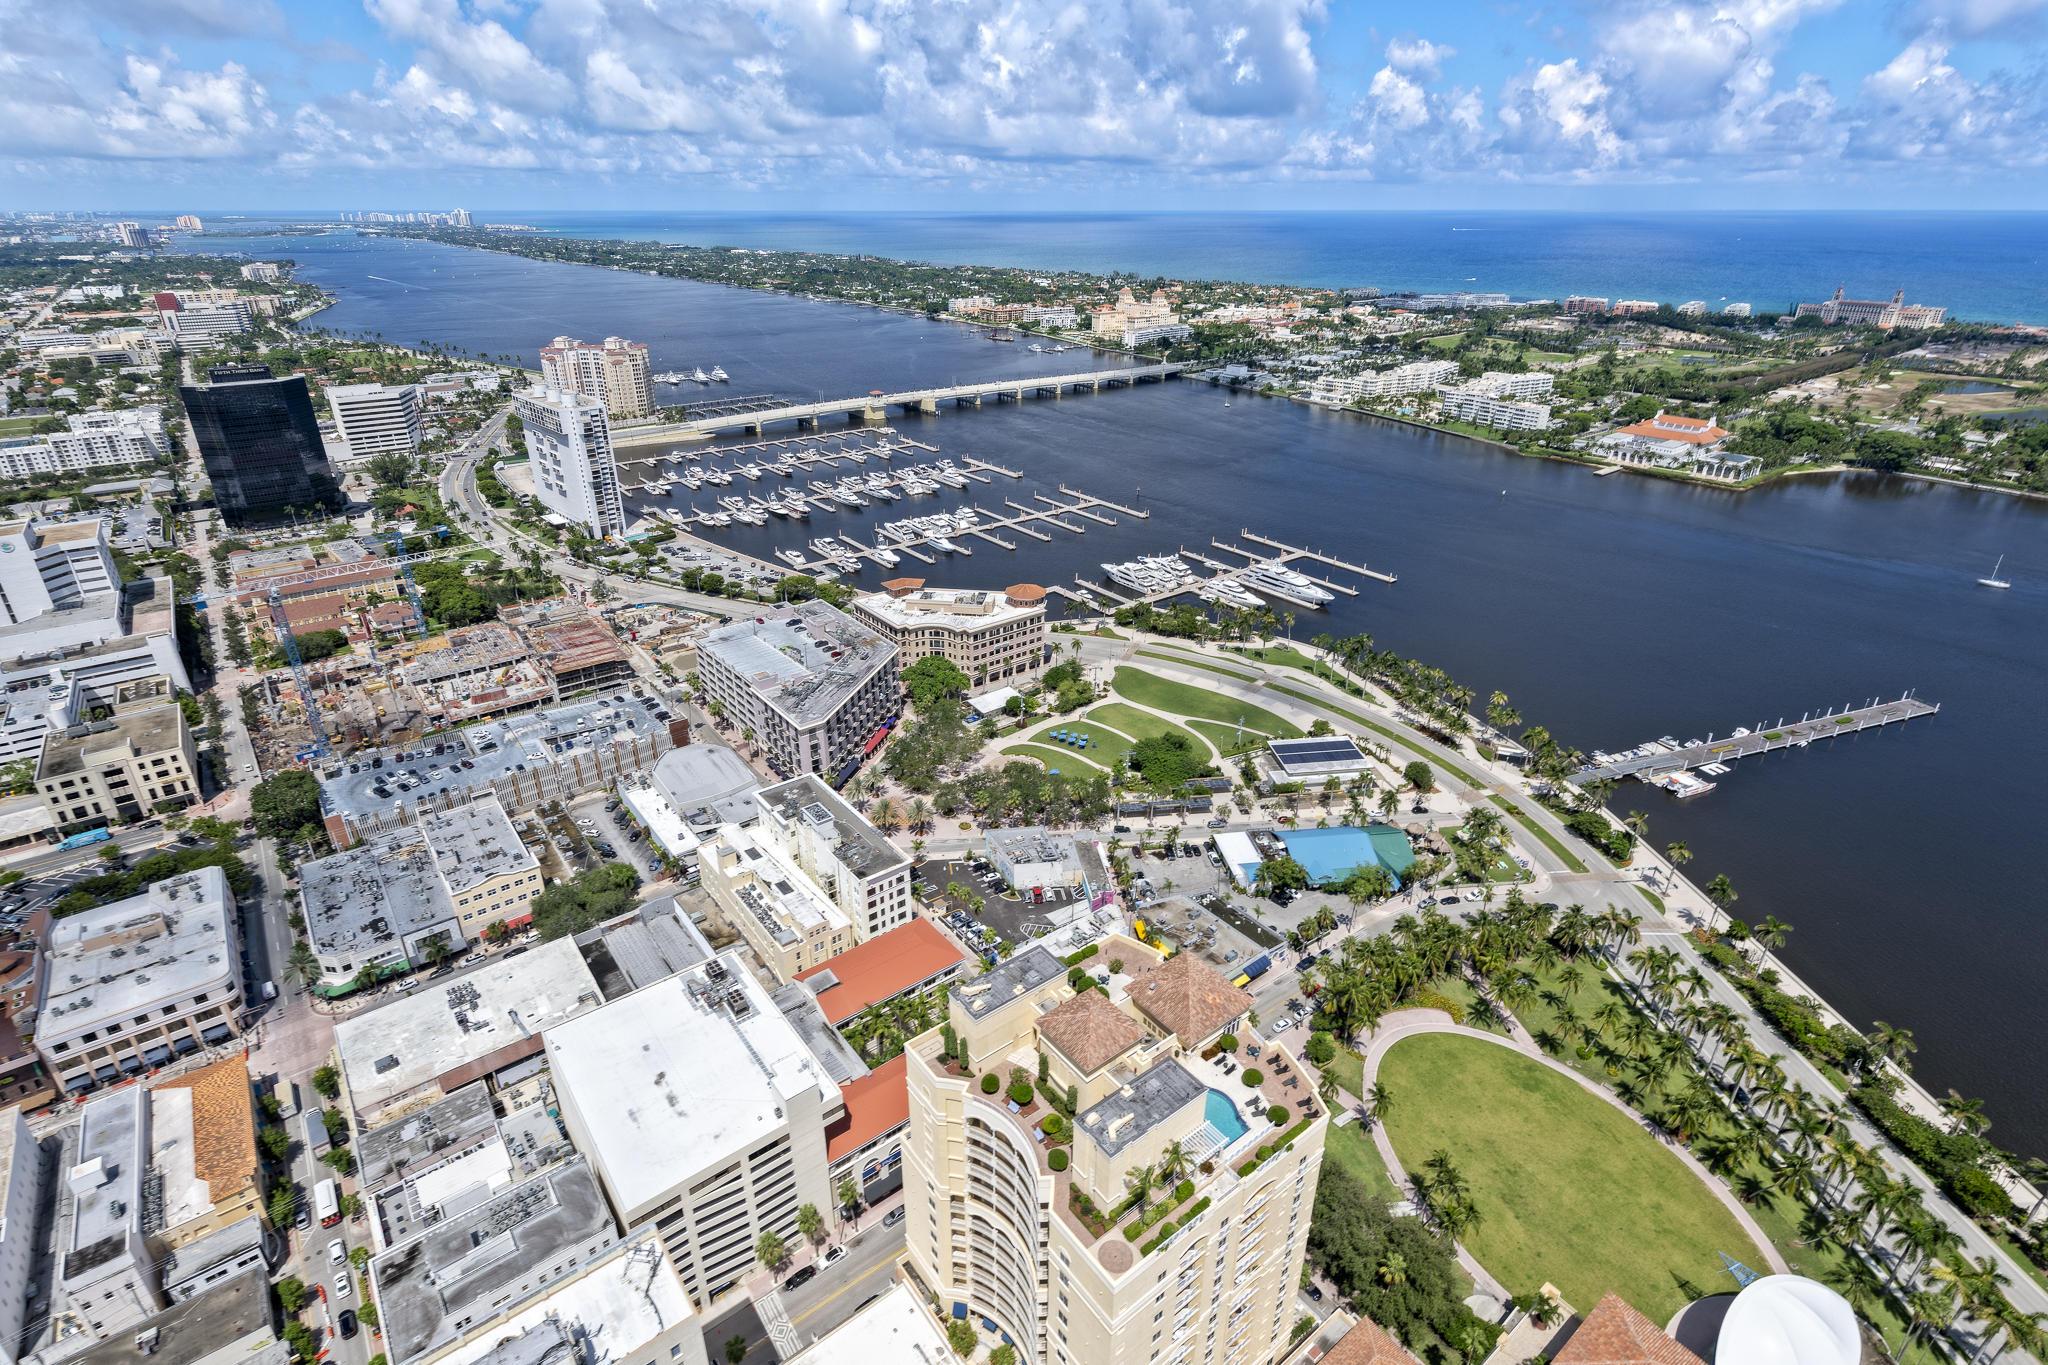 EASTPOINTE SINGER ISLAND FLORIDA